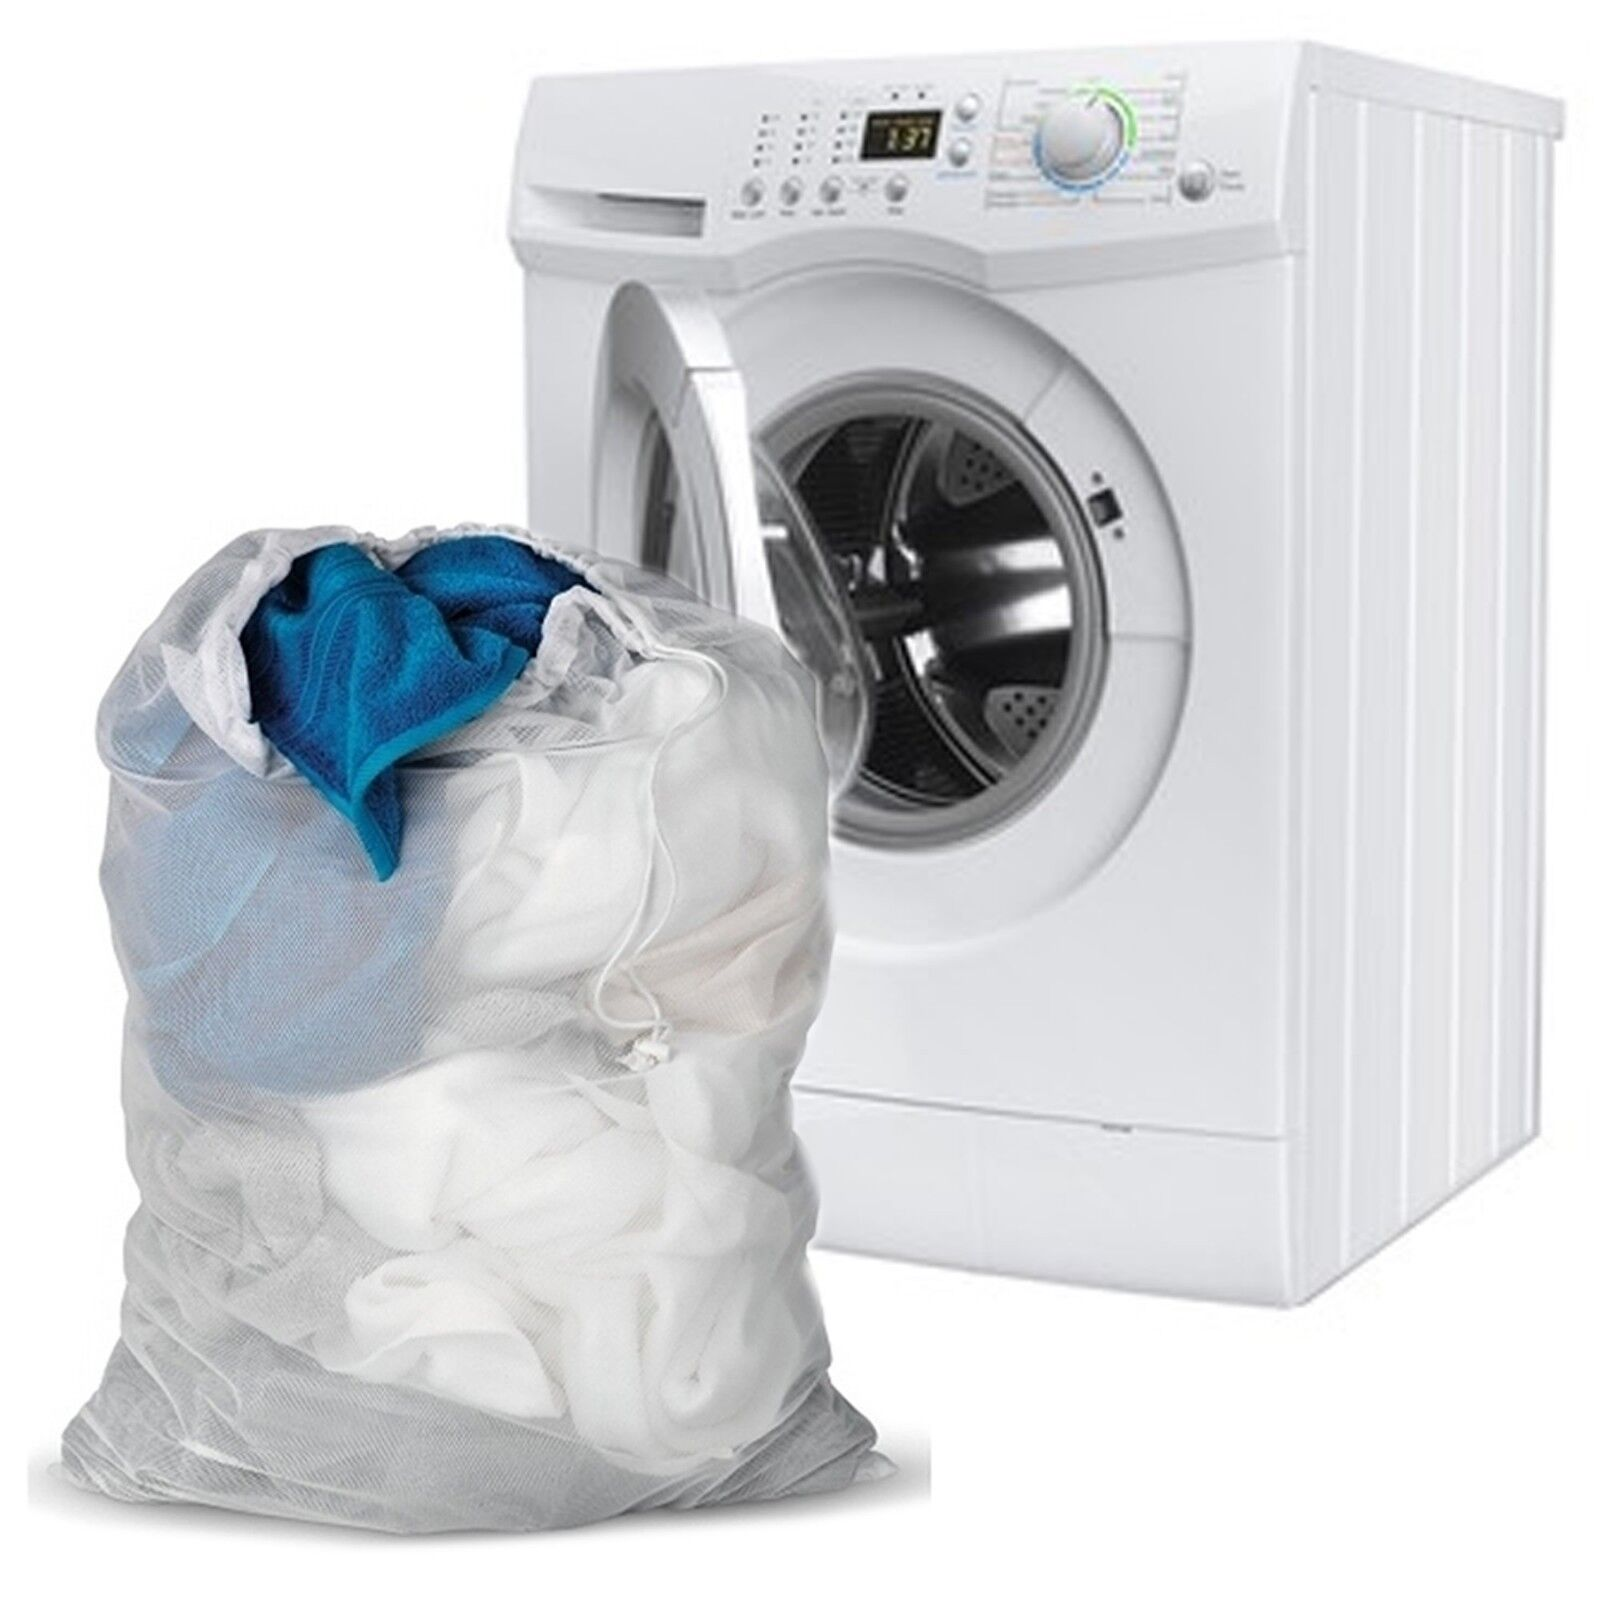 d12eccfb8bb5 Net mesh bag to protect delicate clothes laundry lingerie socks bra wash  machine